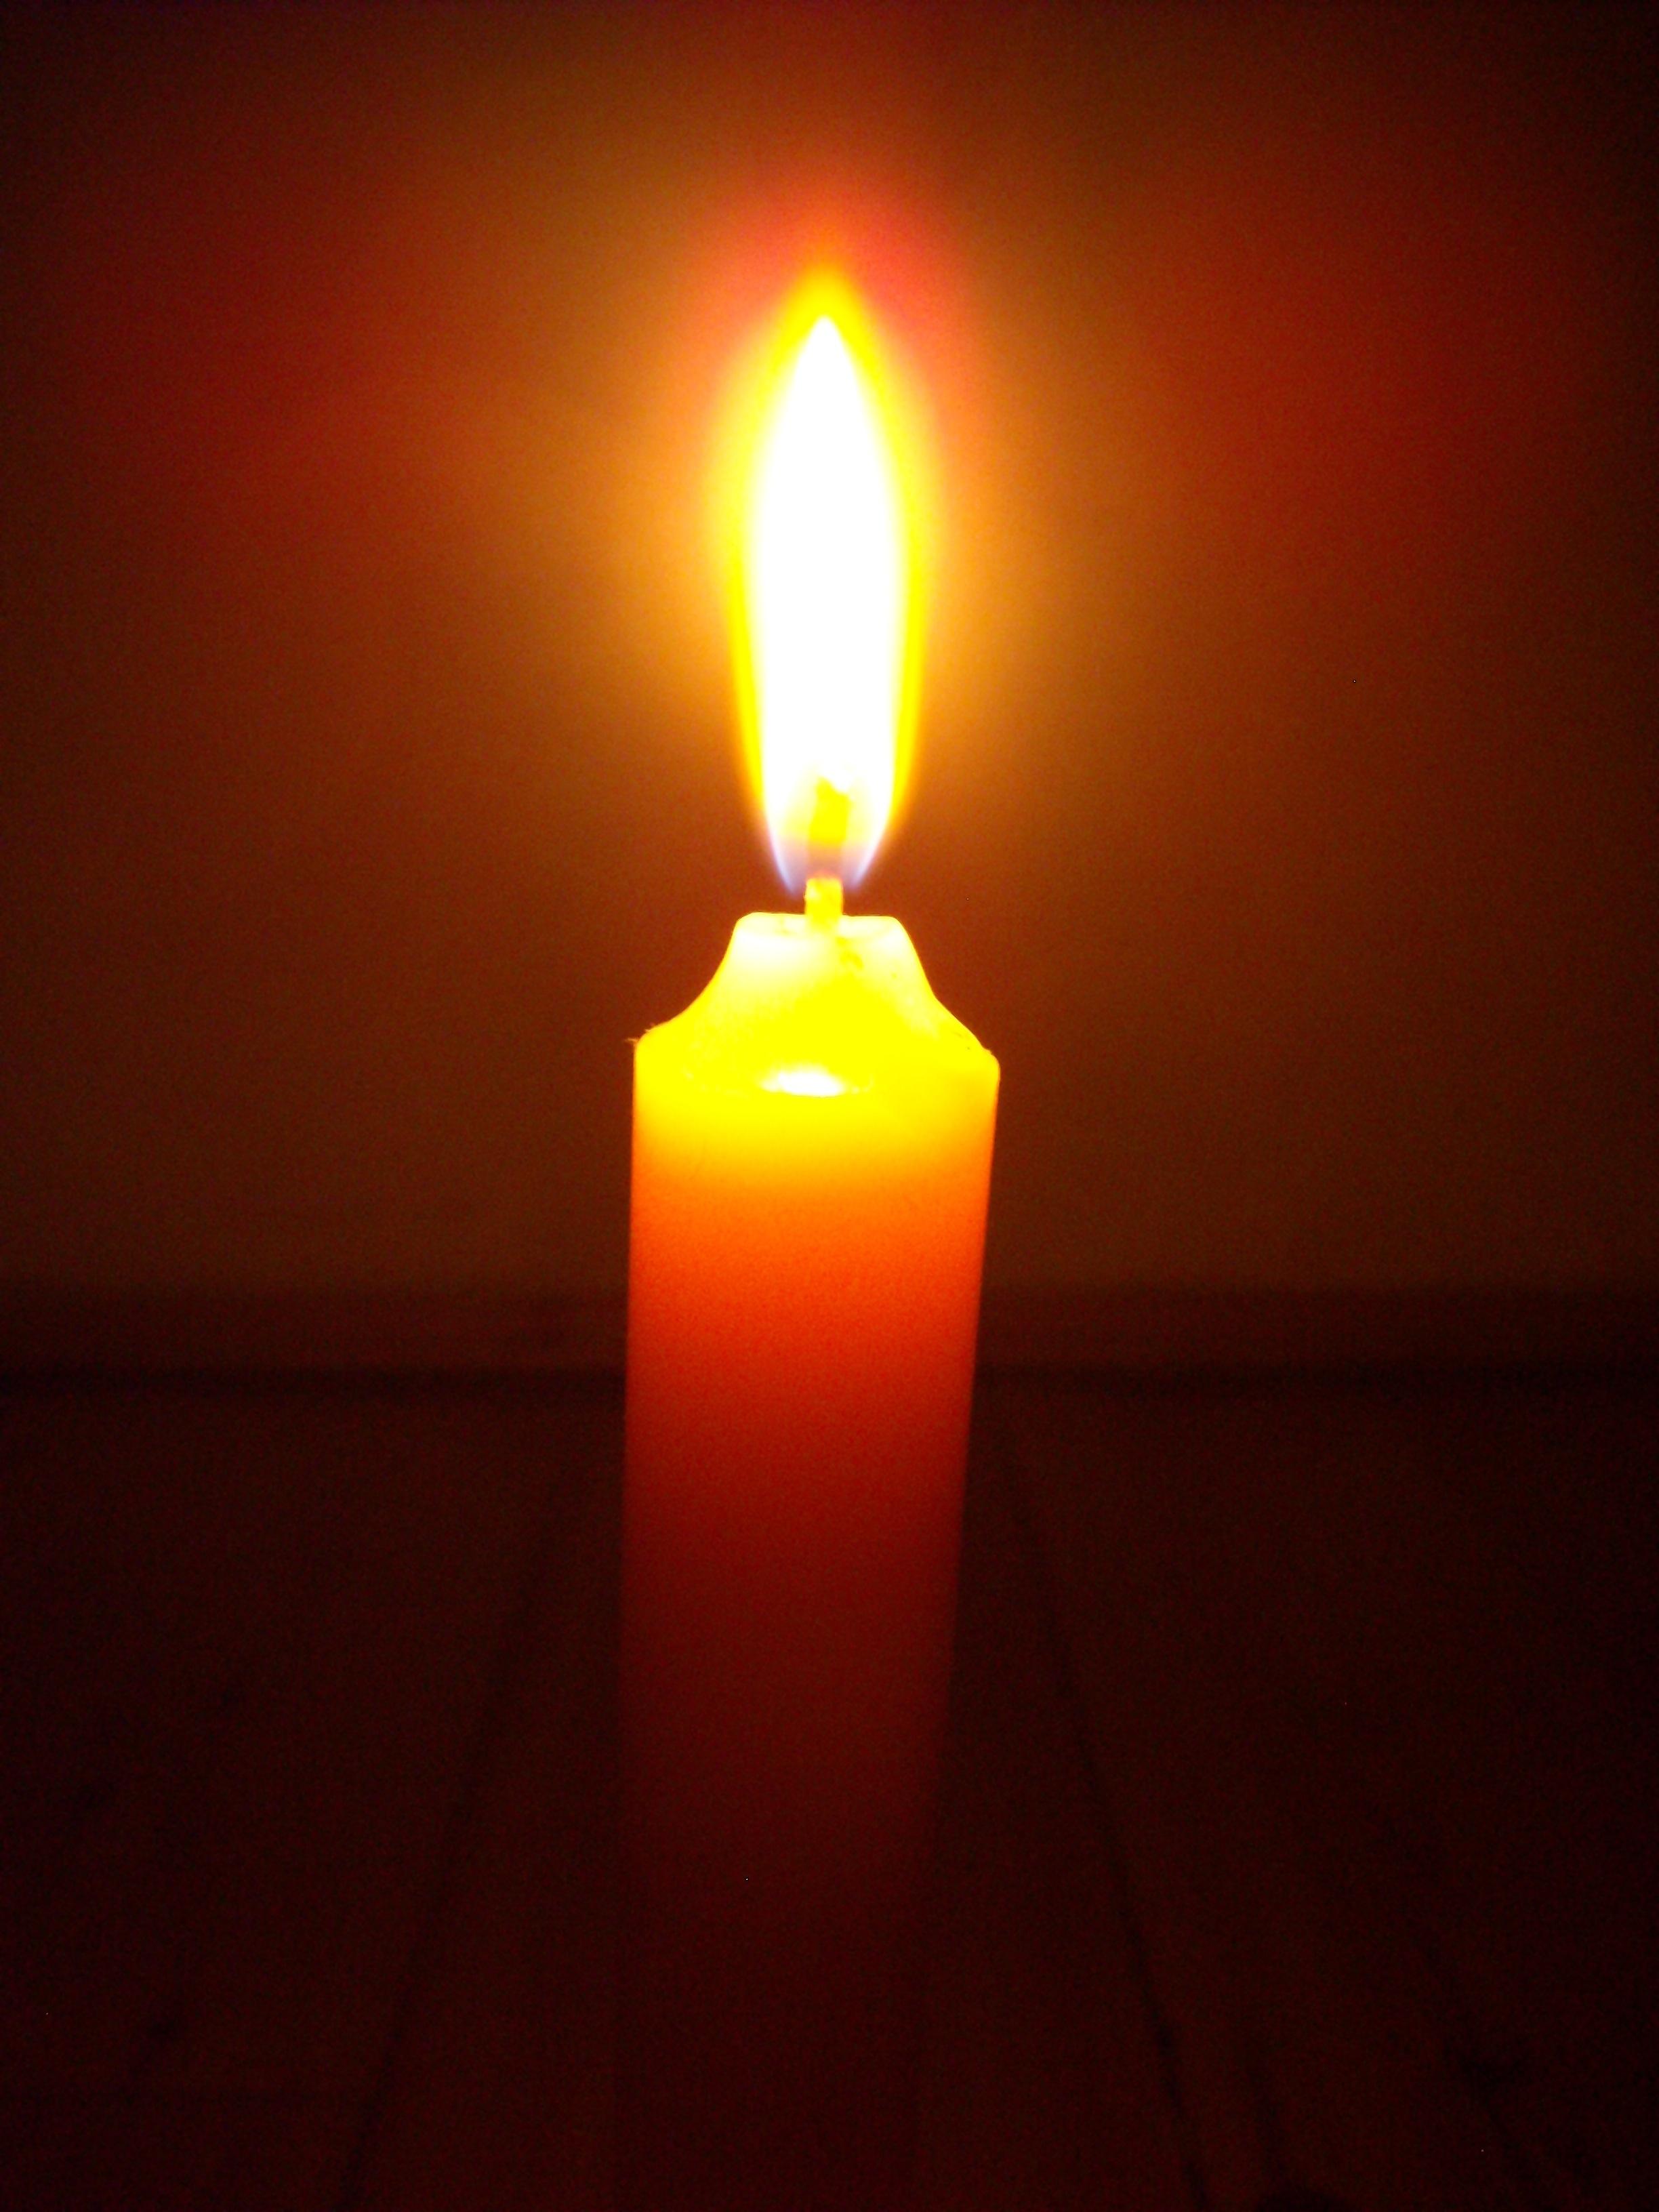 Candle Light Wallpaper HD Freetopwallpapercom 2448x3264